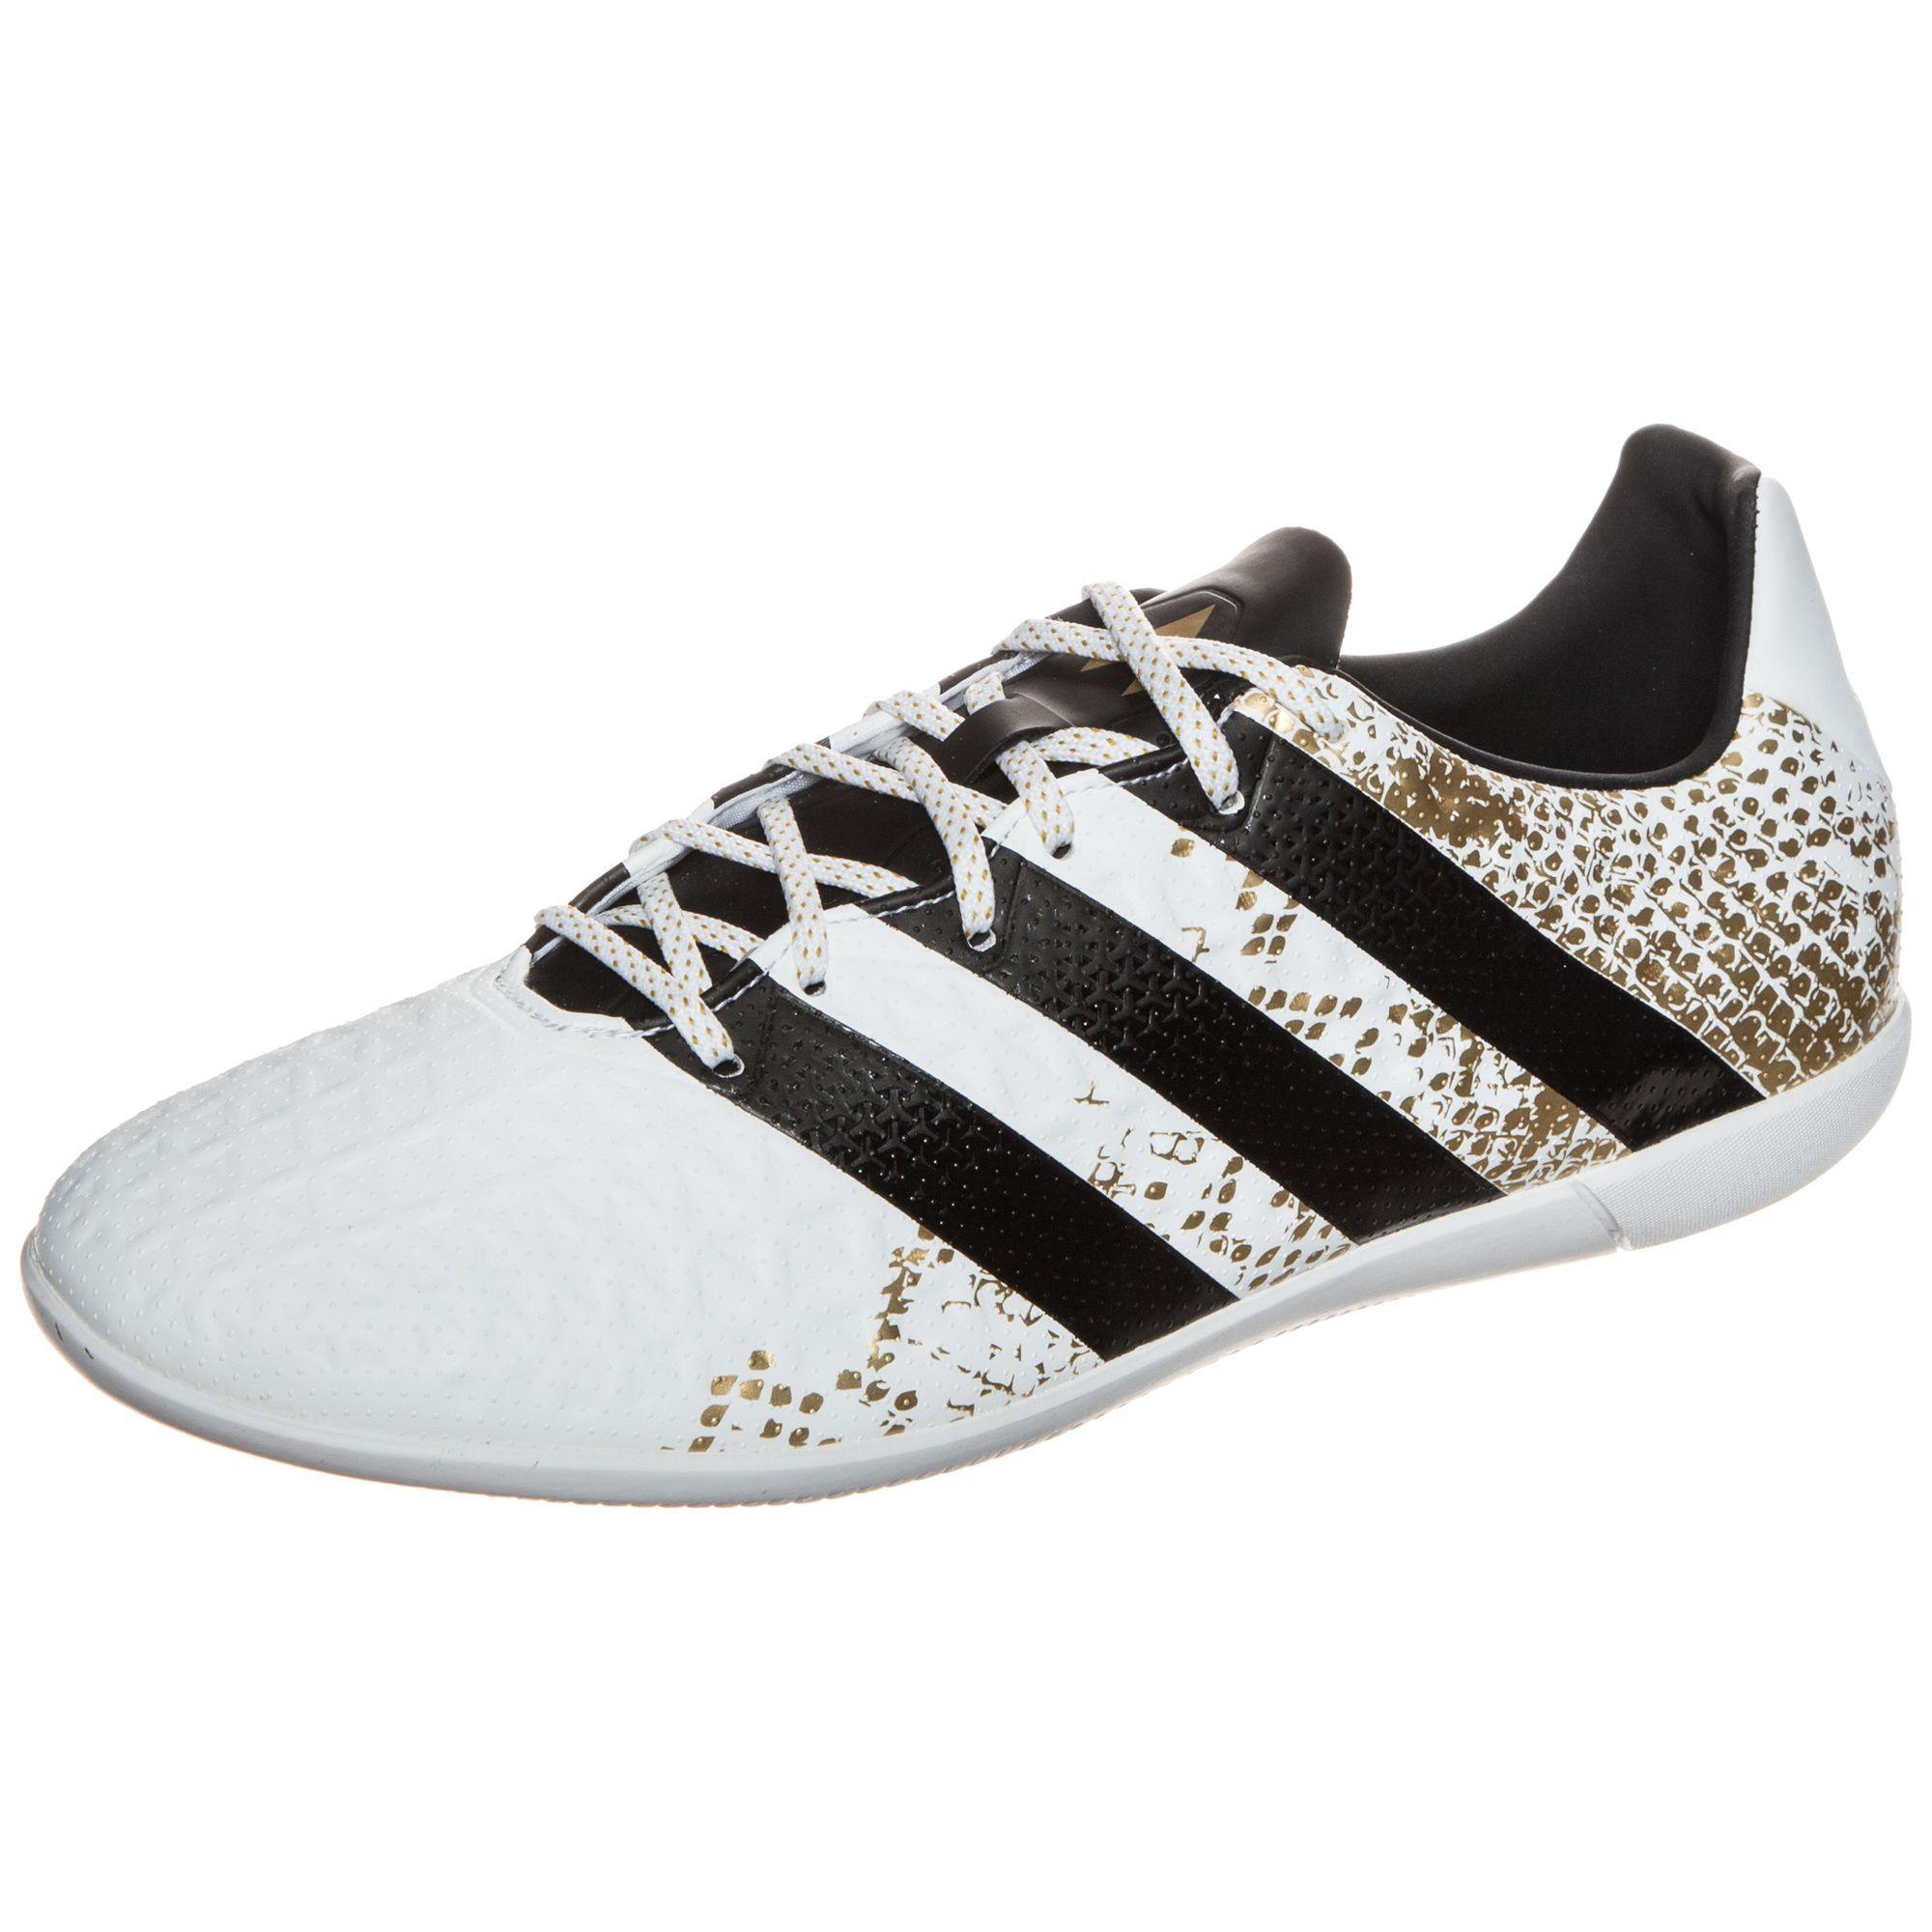 ADIDAS PERFORMANCE adidas Performance ACE 16.3 Indoor Fußballschuh Herren